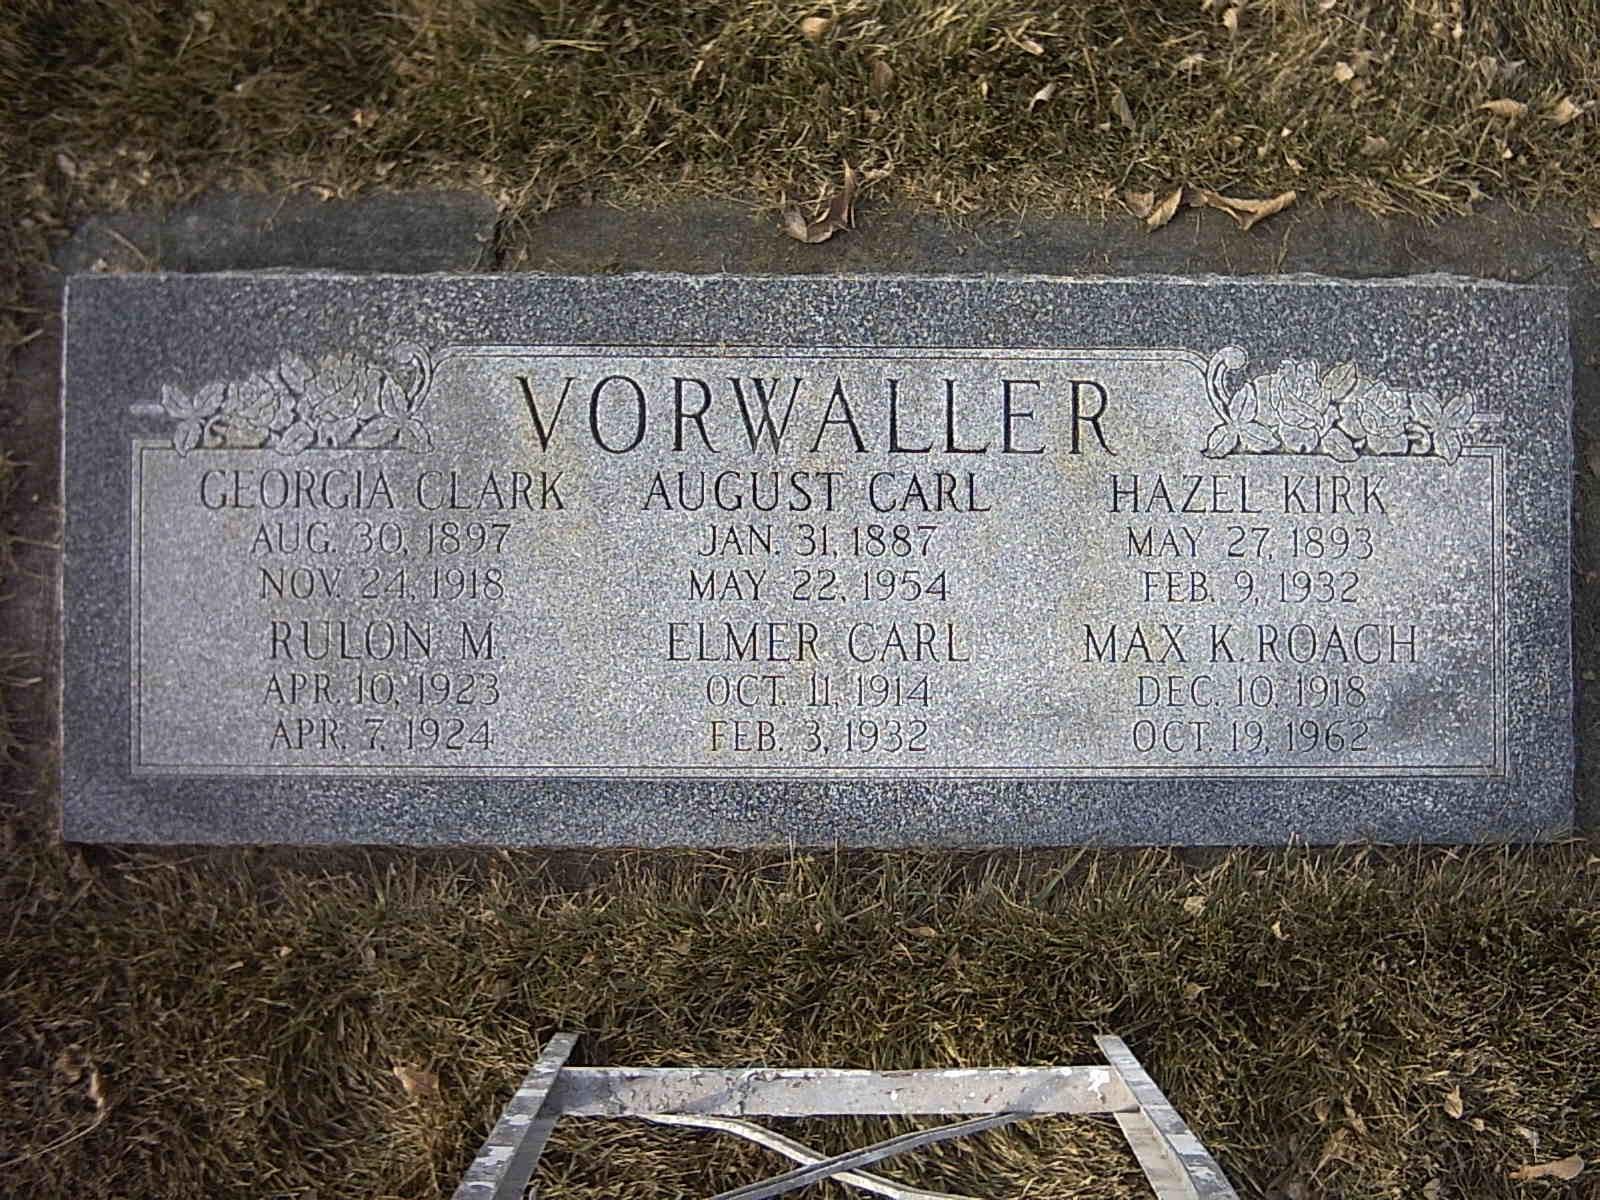 Karl August Vorwaller